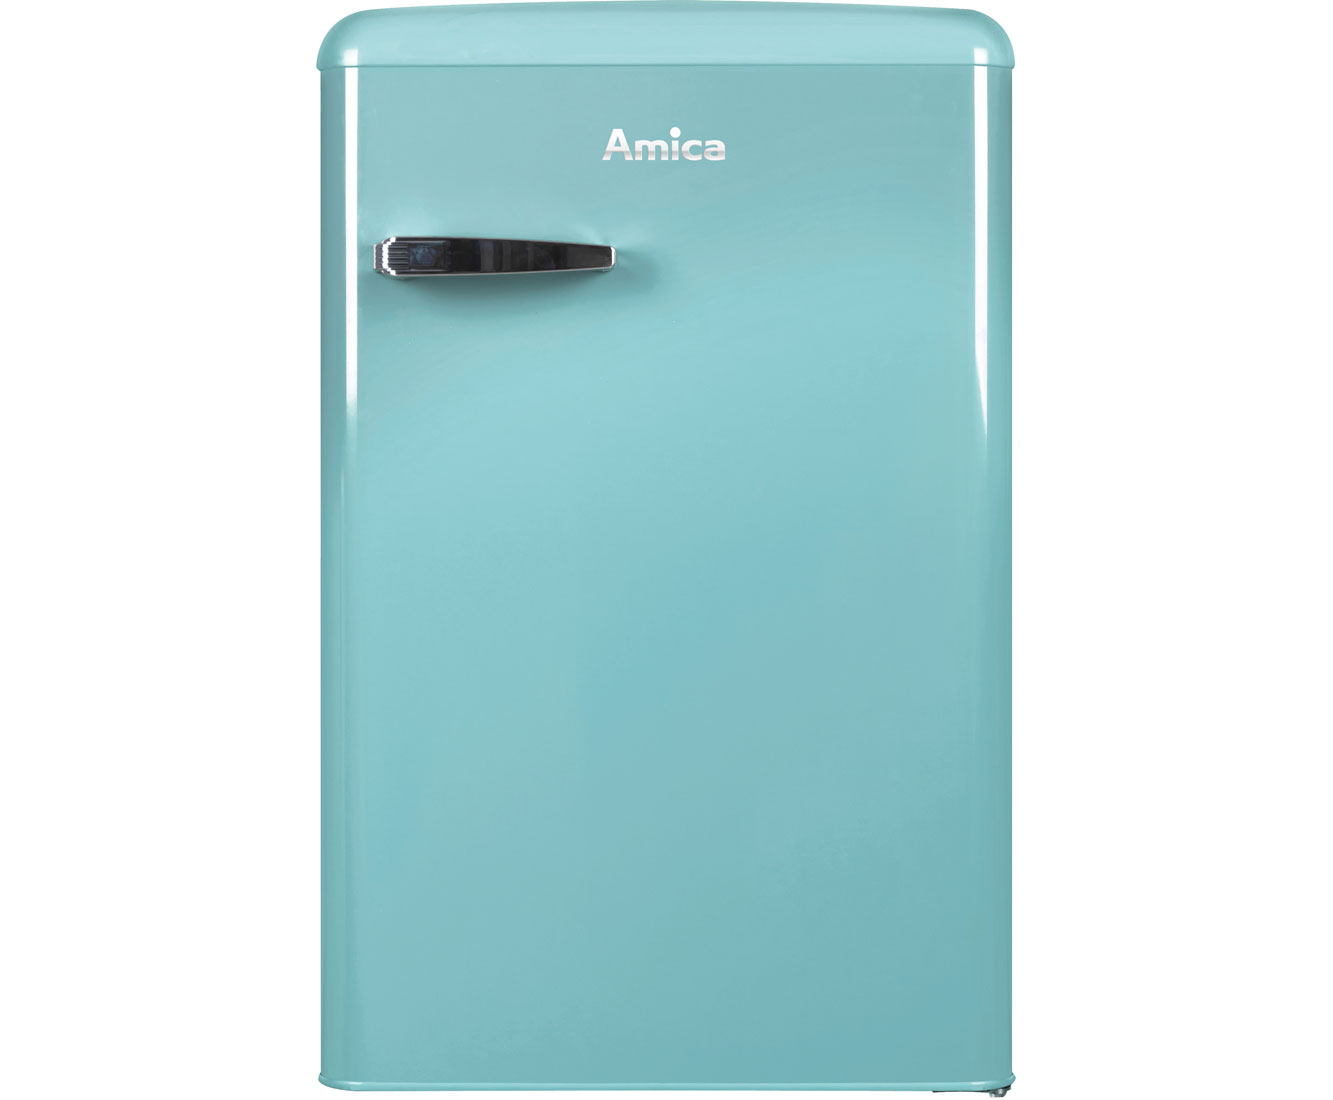 Amica Kühlschrank Idealo : Amica vks t kühlschrank türkisblau retro design a